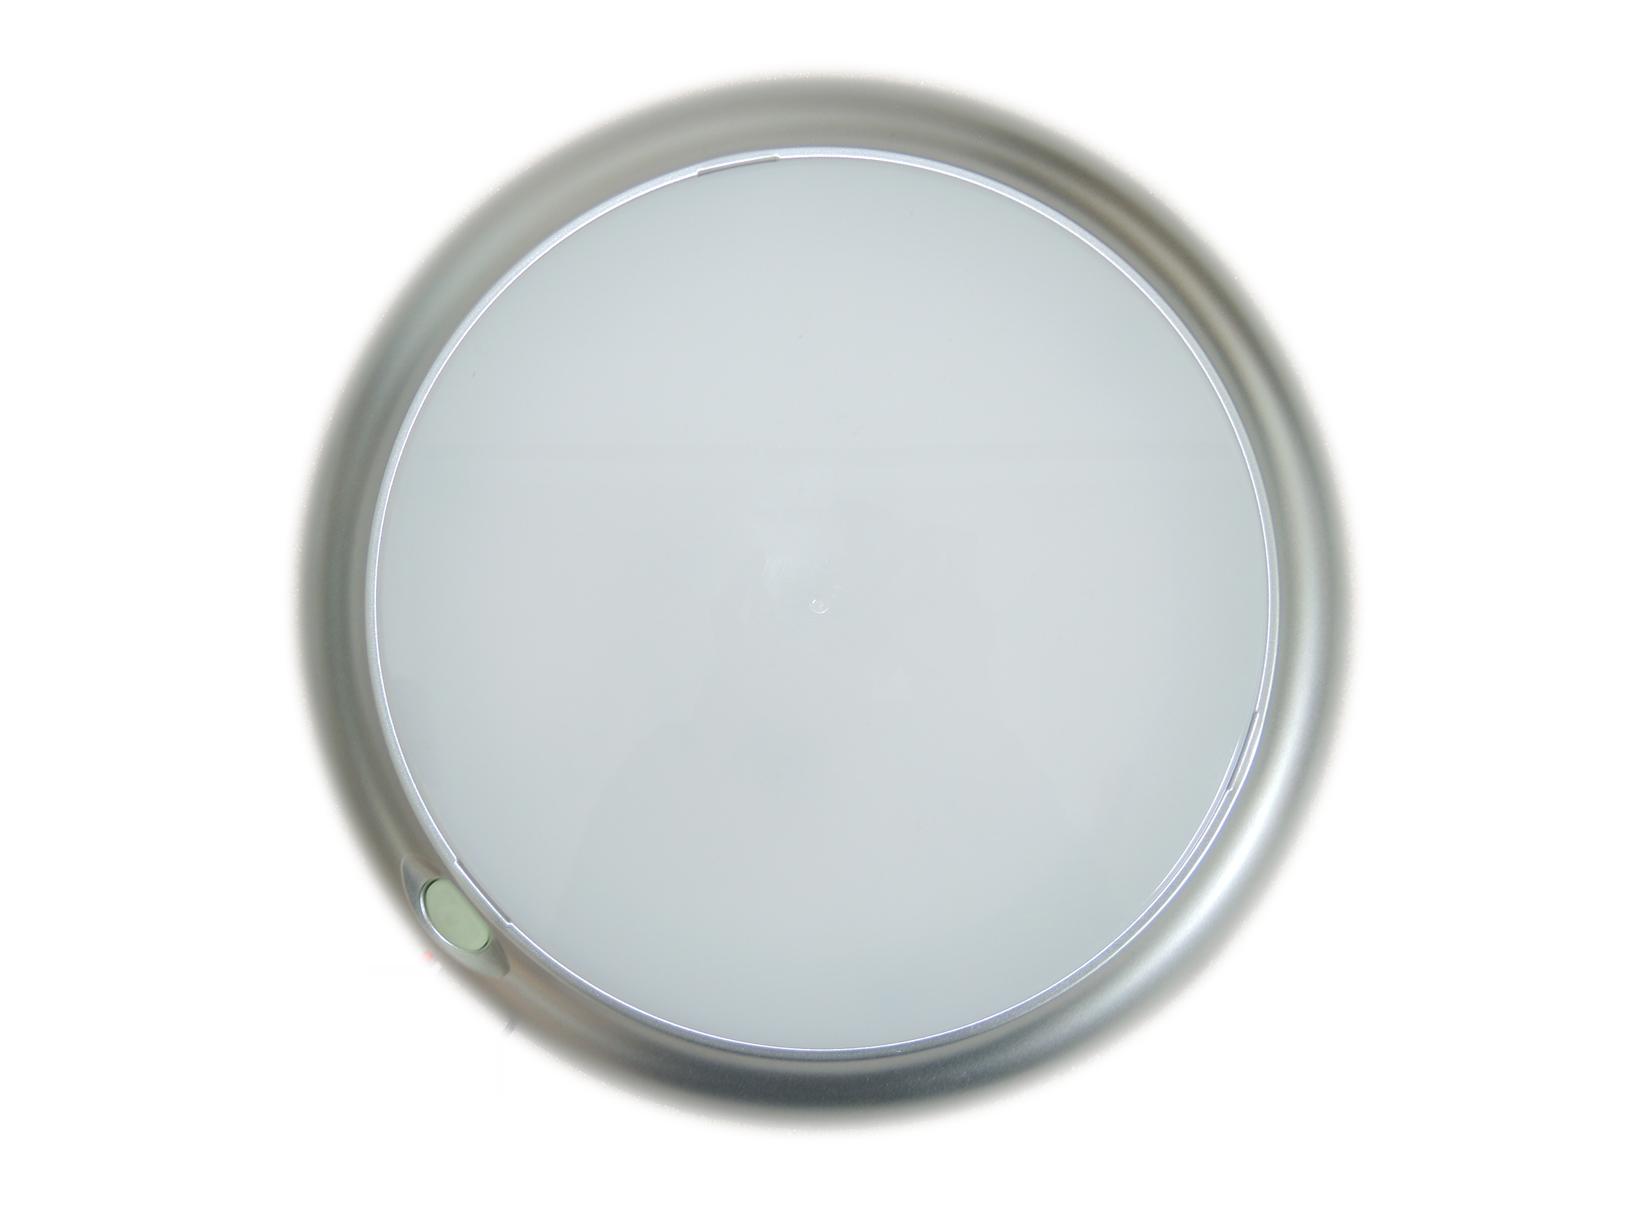 Rood of Warm wit LED plafonnière met schakelaar 12 volt 24 volt 10-30 volt